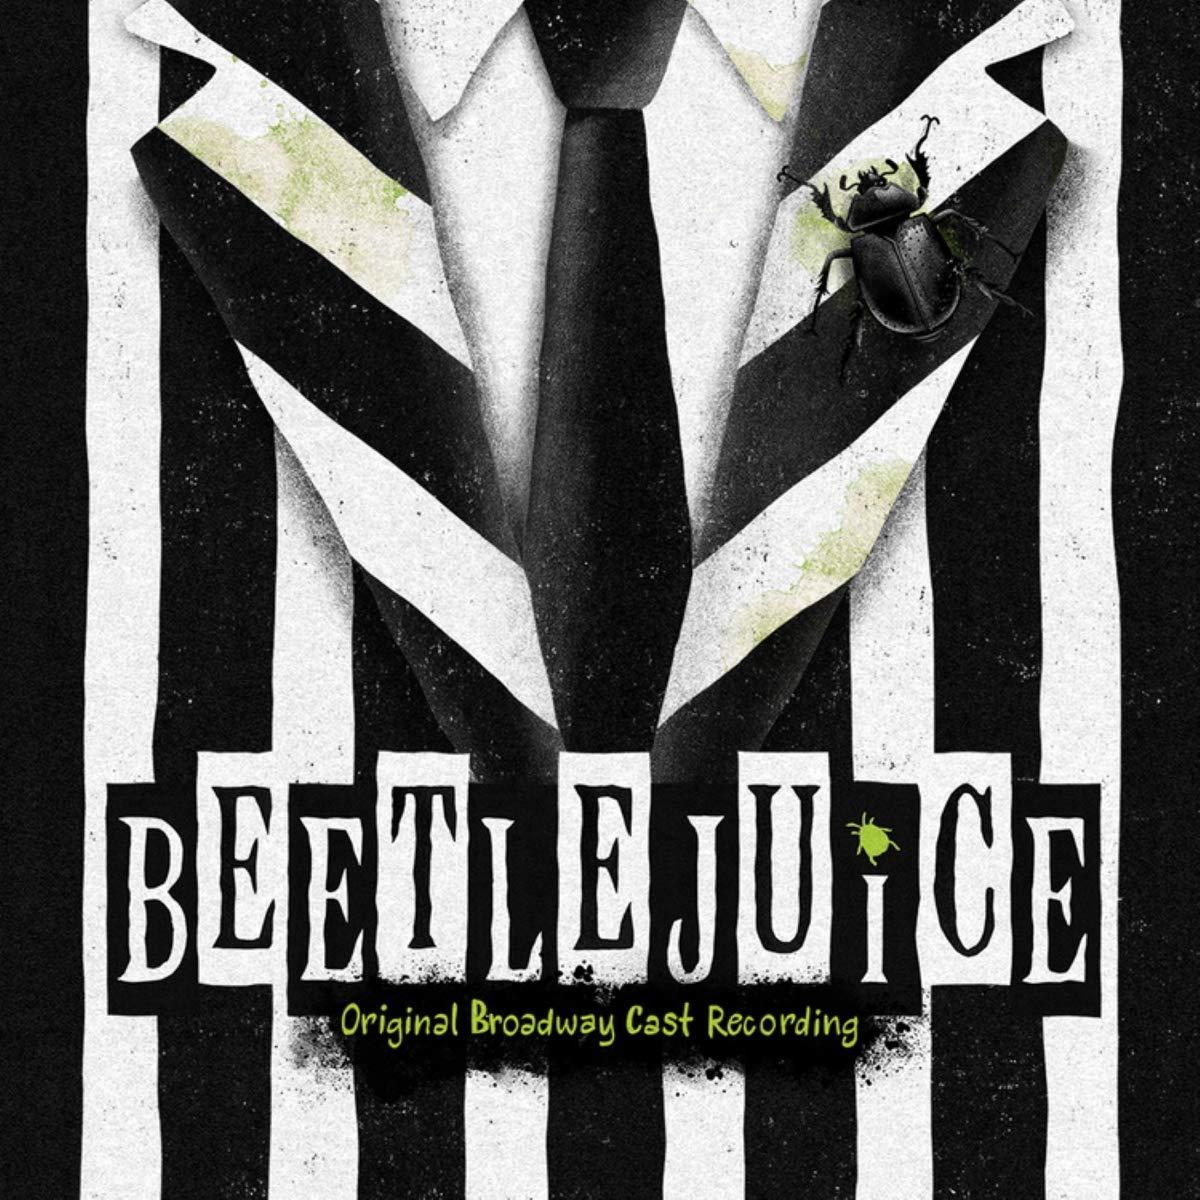 Beetlejuice_logo